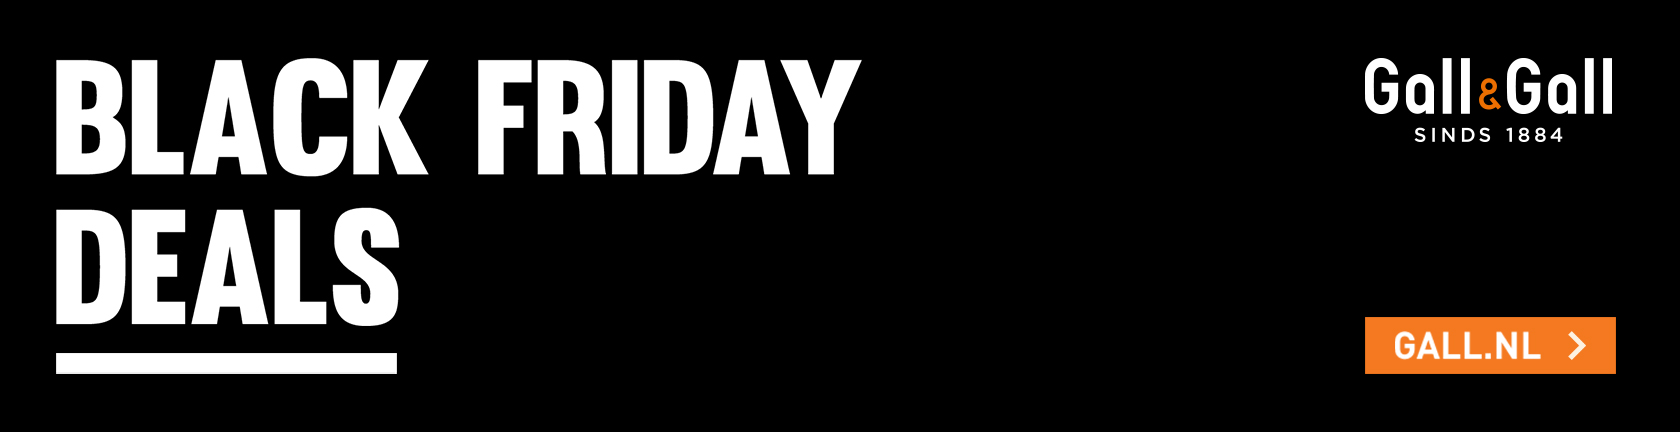 Black Friday deals bij Gall & Gall ga naar Gall.nl